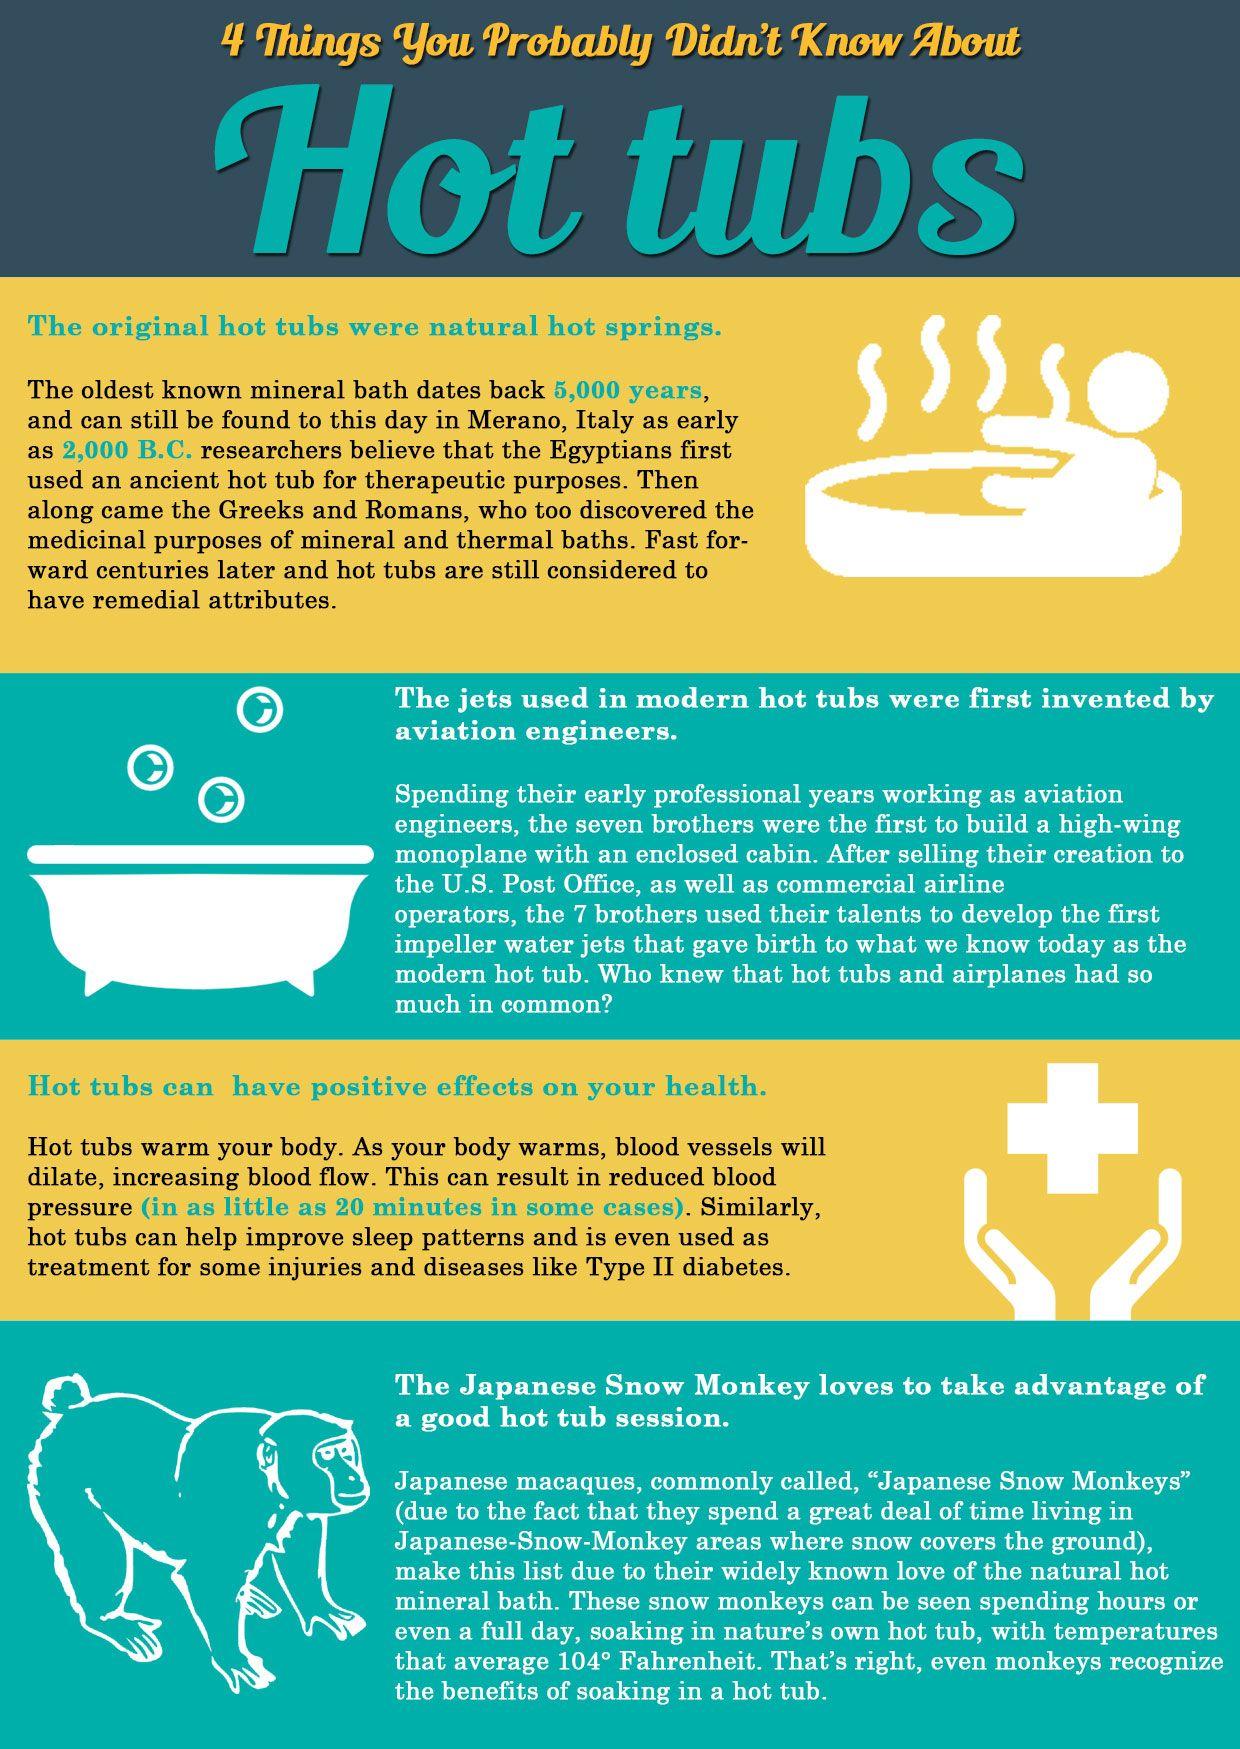 Http Www Londonessexhottubs Com Swim Spa Swim Spas Hydrotherapy Pool Indoor Hot Tub Hot Tub Spa Hydropool Hot Tub Outdoor Health Info Jacuzzi Hot Tub